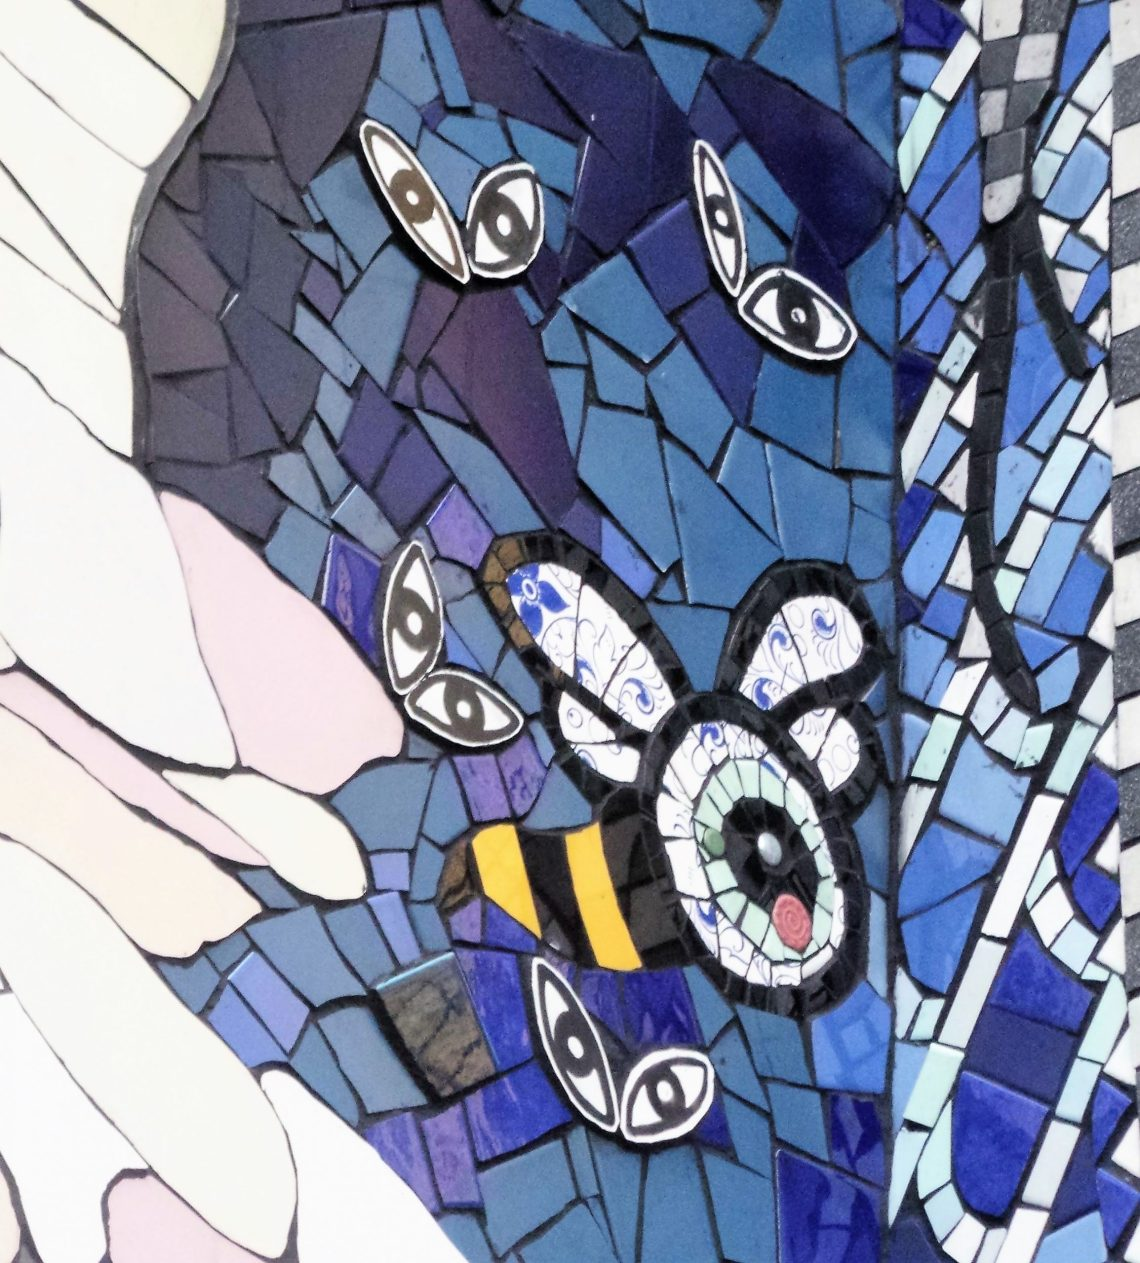 butterfly eyes nevanka pavic carrie reichardt